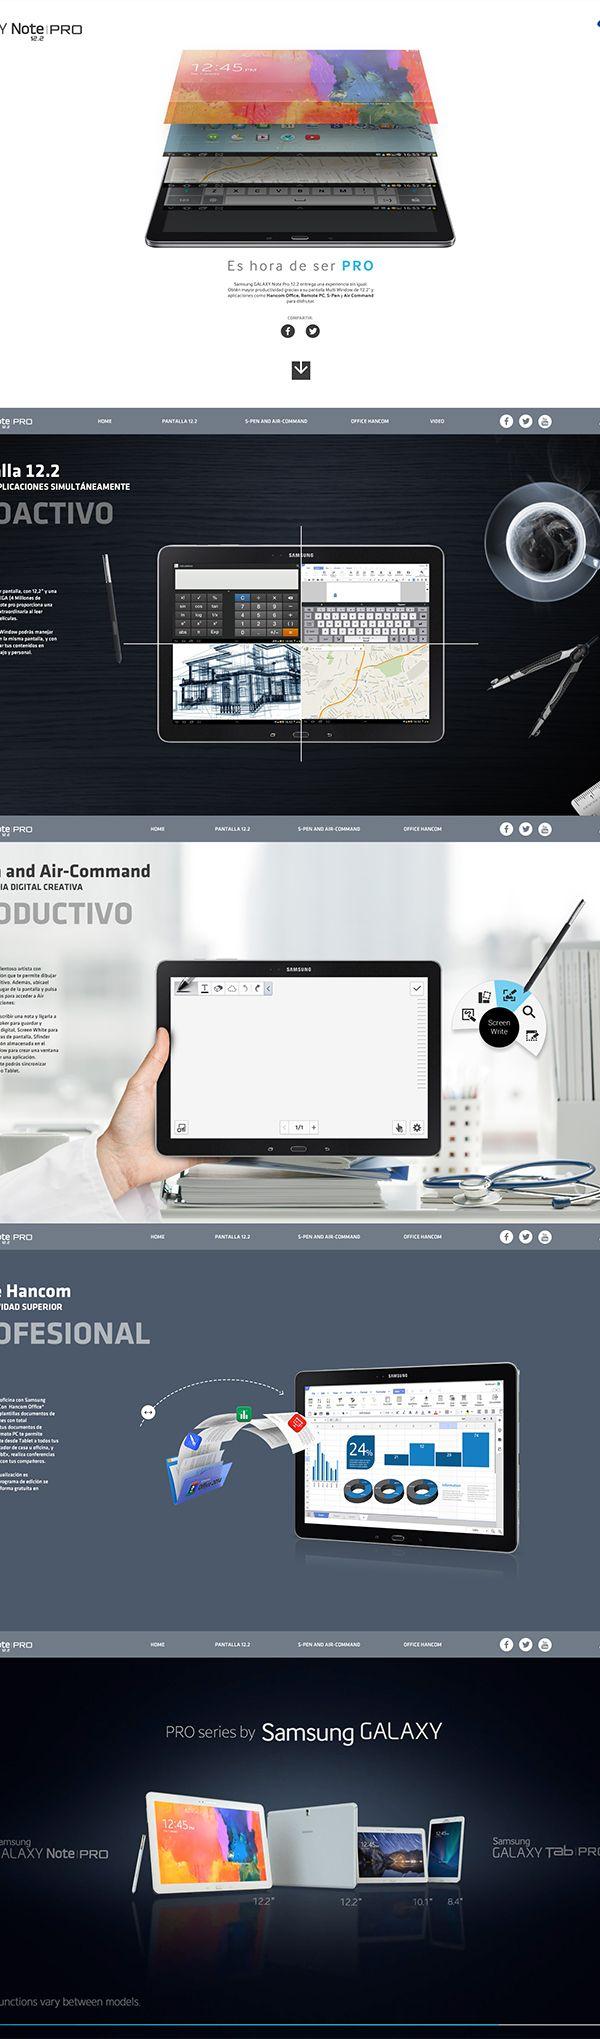 Samsung Galaxy Note Pro by Roberto Uribe. http://bit.ly/1BufrDd